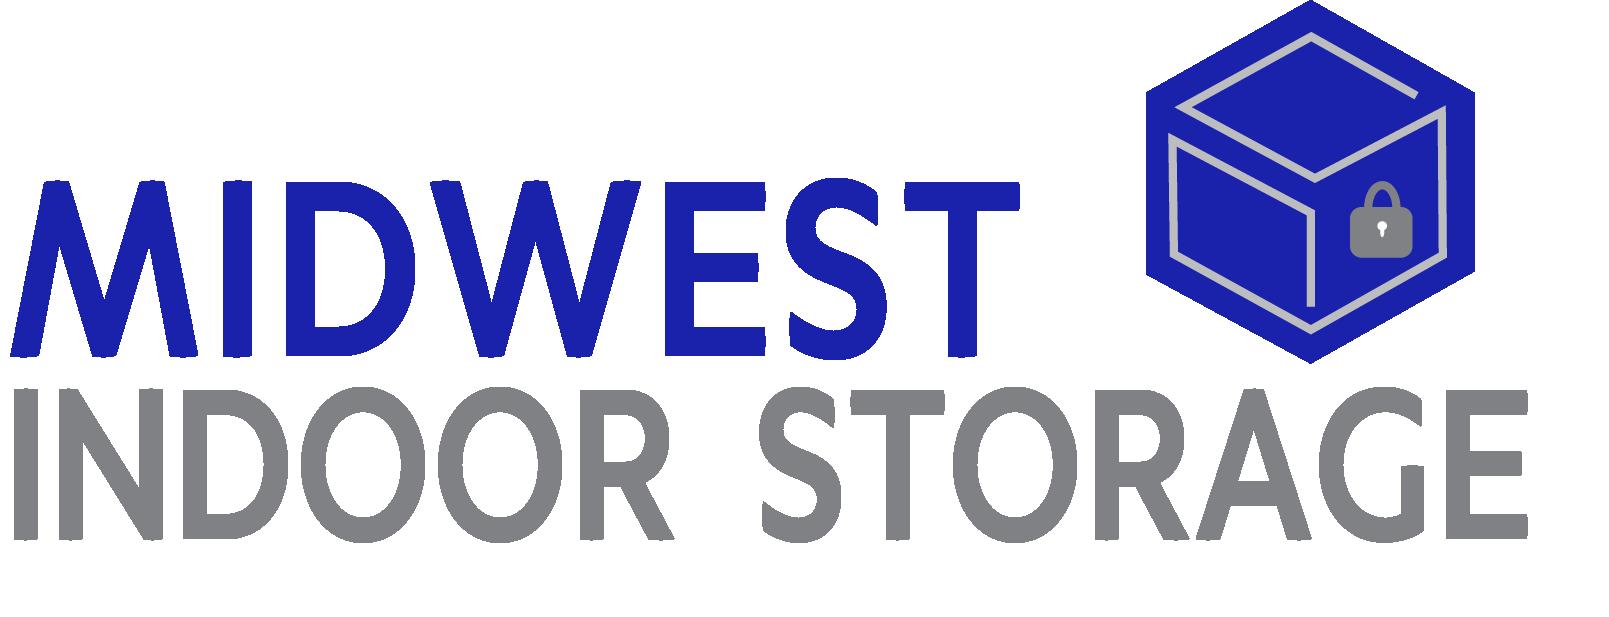 Midwest Indoor Storage Logo